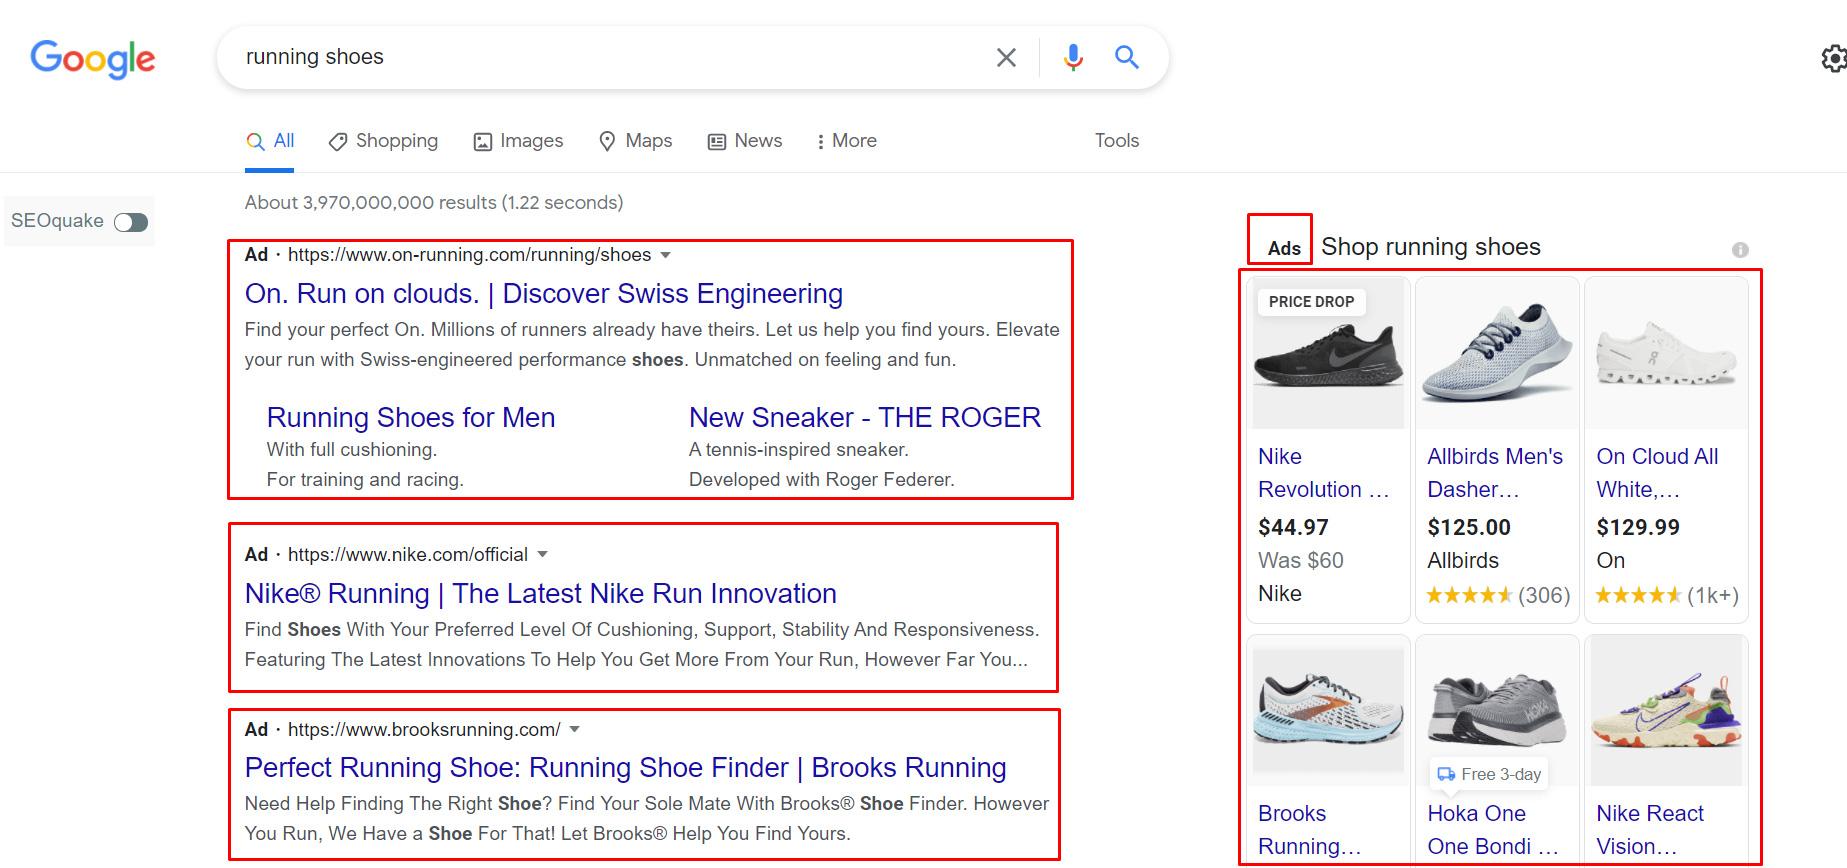 Google Advertising via Ads